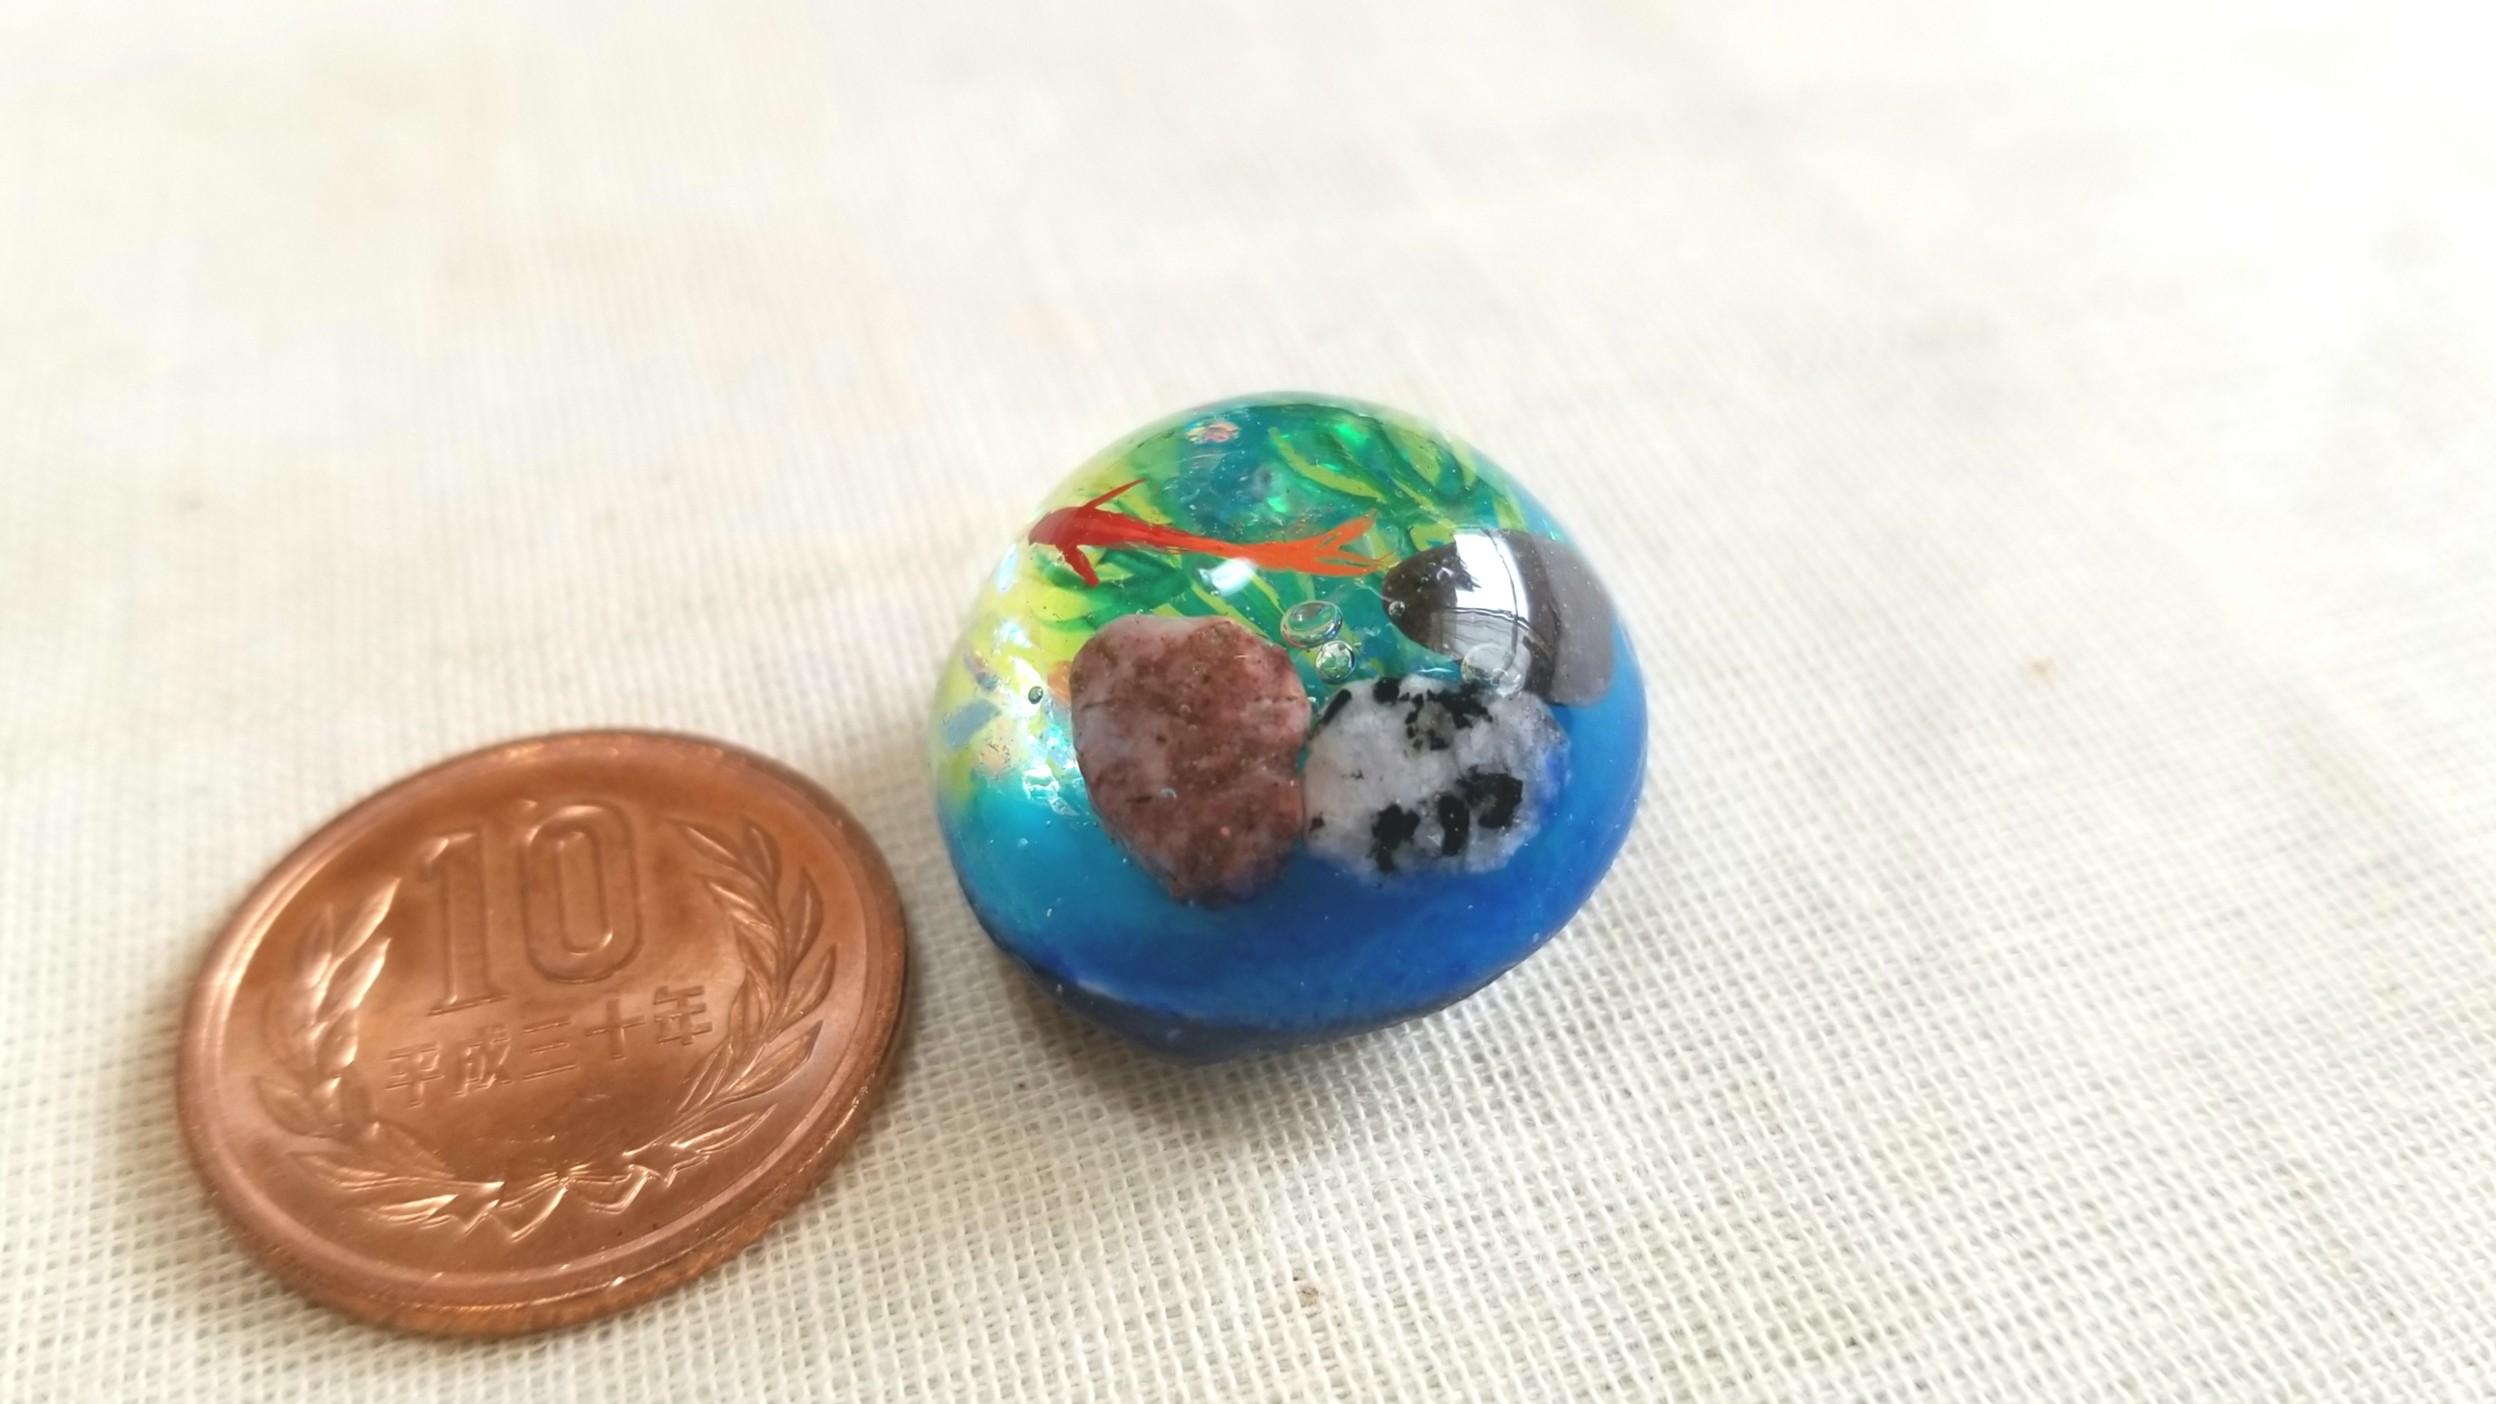 Twitterプレゼント企画当たった,運気アップ好運,レジン小物綺麗な石